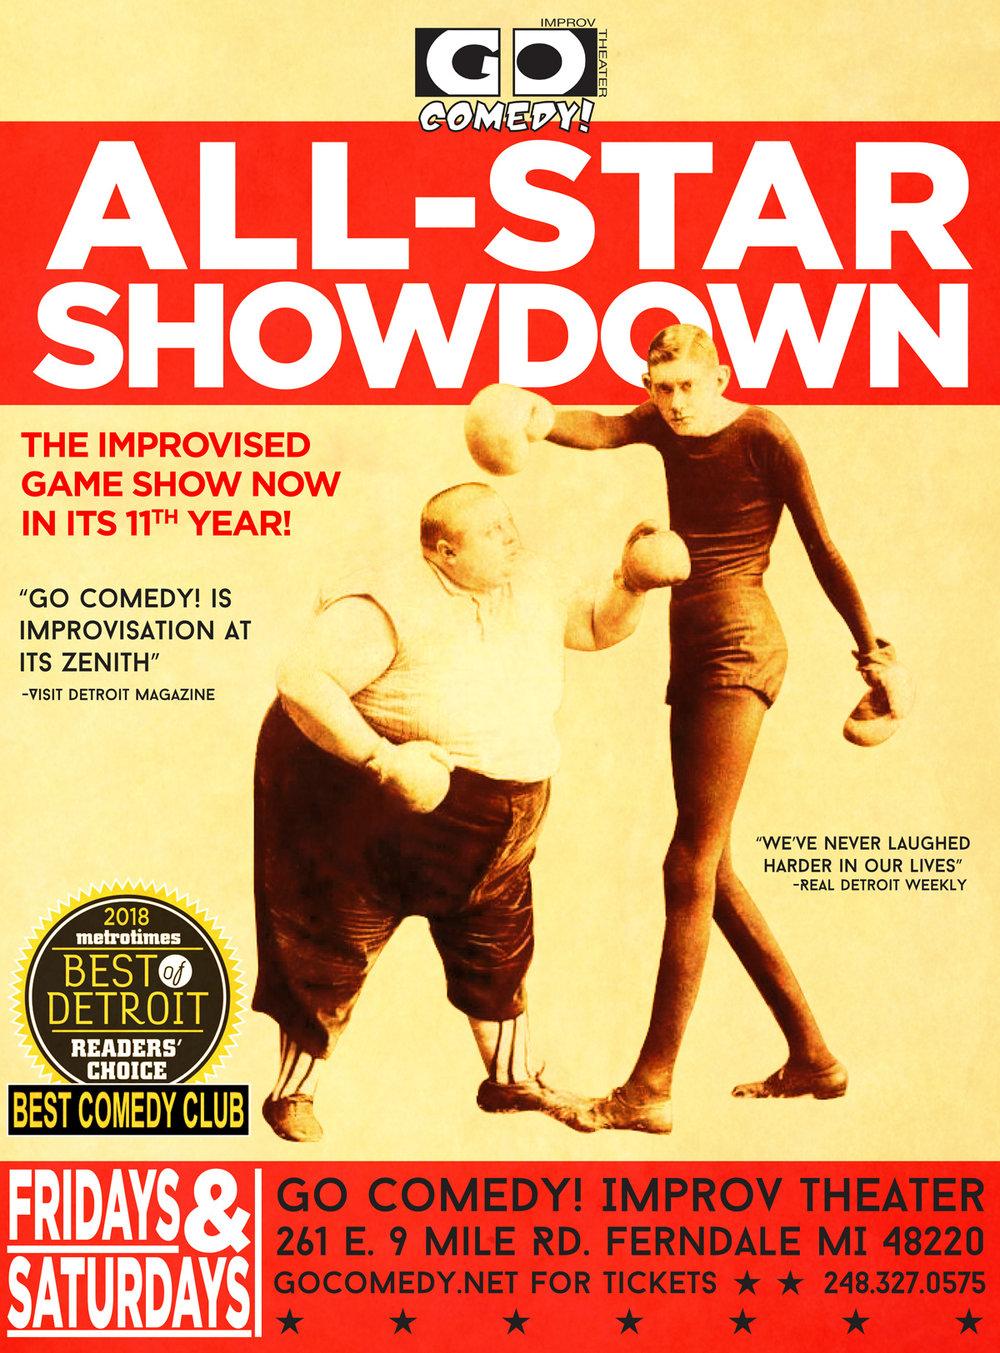 Allstar-Showdown-2019-web.jpg